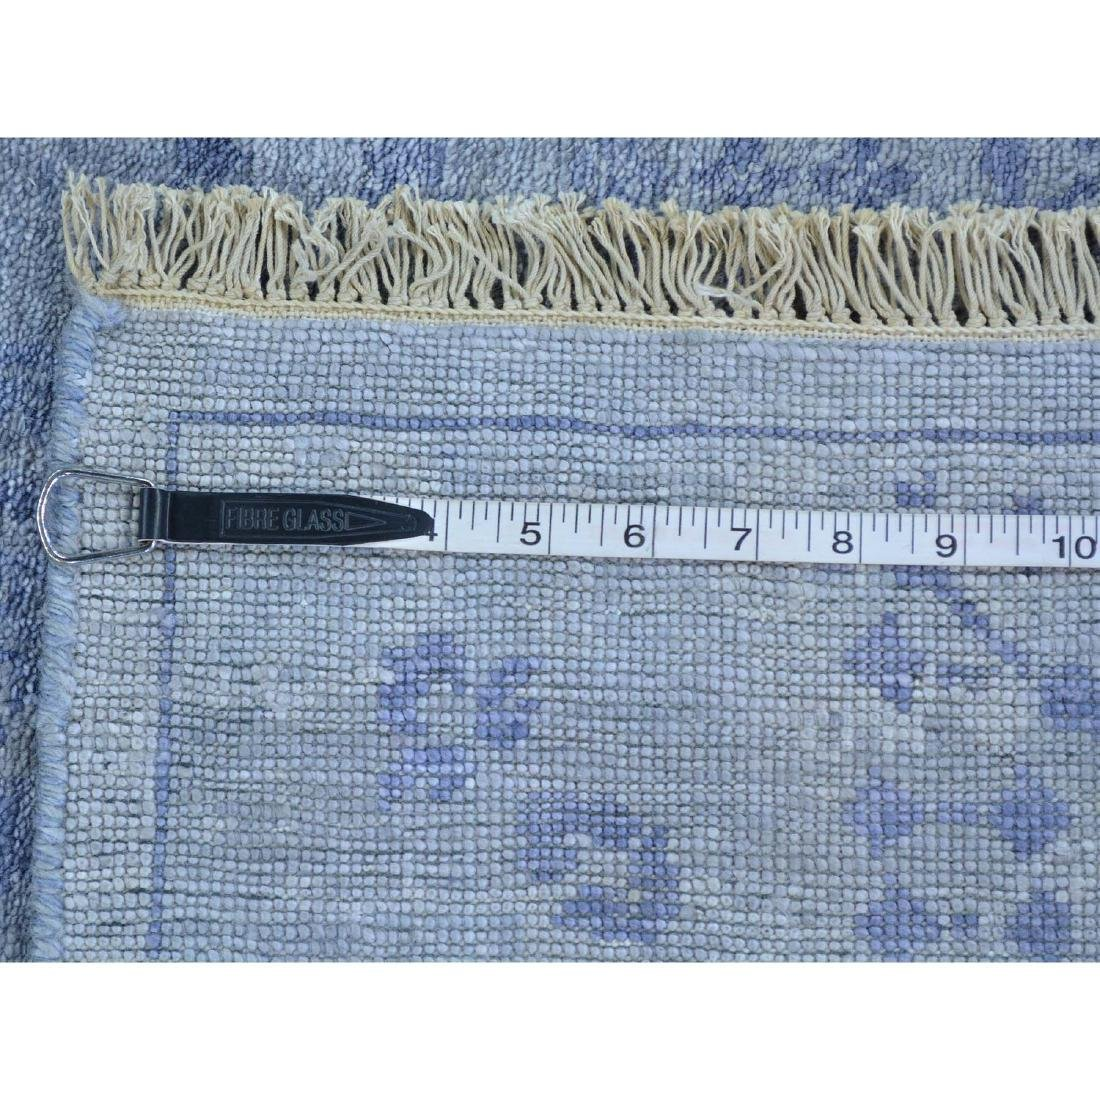 Runner Wool and Silk Tone on Tone Tabriz Handmade Rug - 5